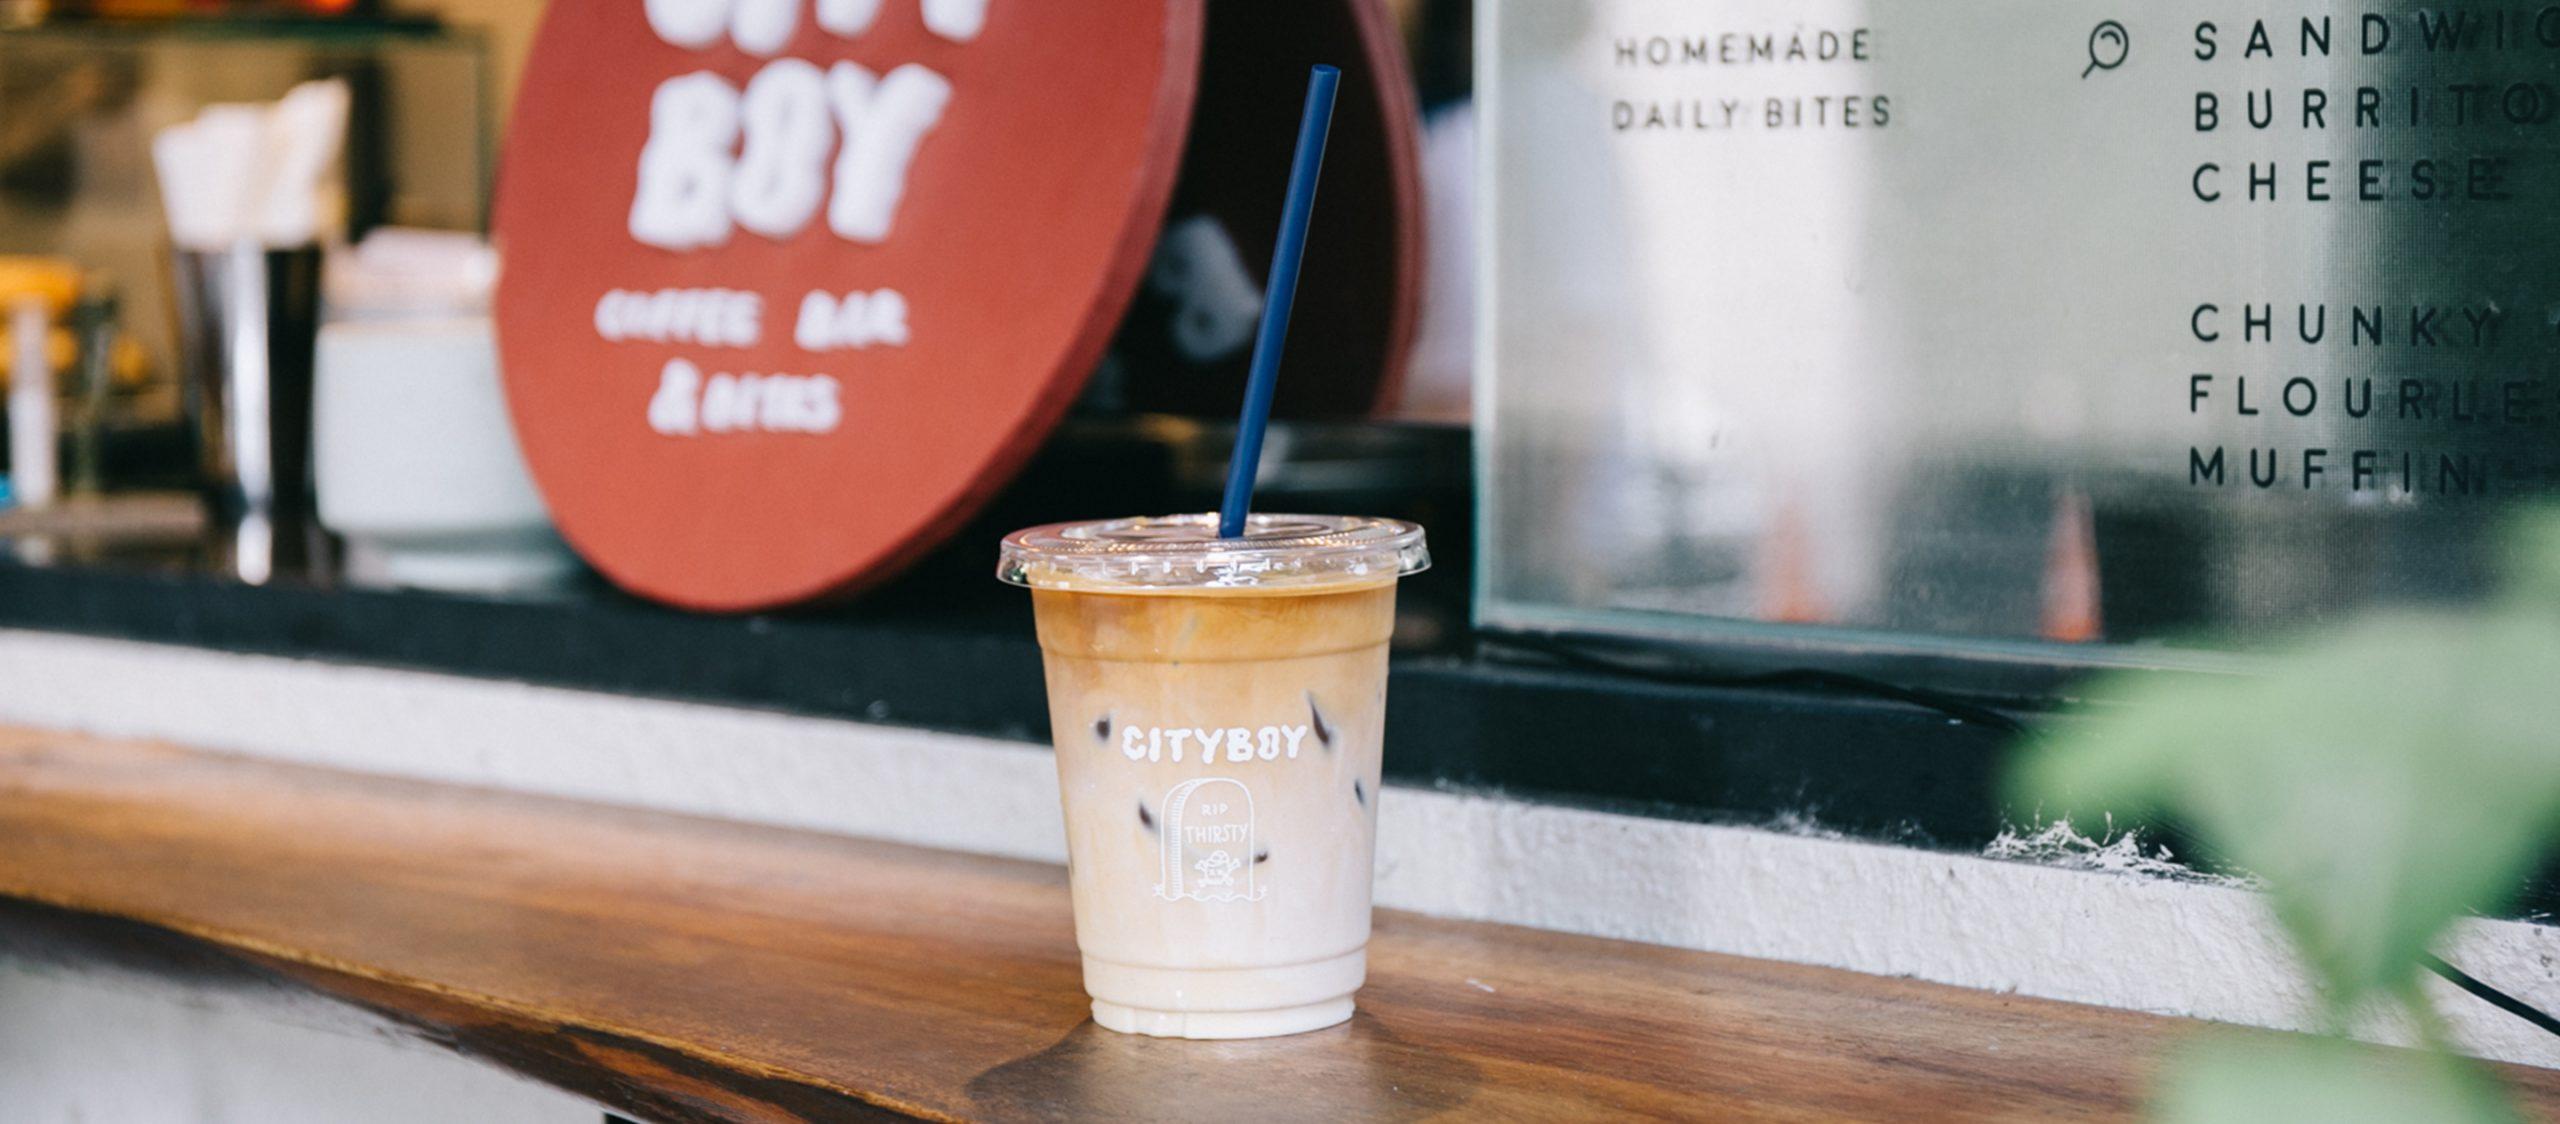 4 Coffee Stands คาเฟ่ขนาดกะทัดรัดที่กาแฟทุกแก้วแน่นไปด้วยคุณภาพ